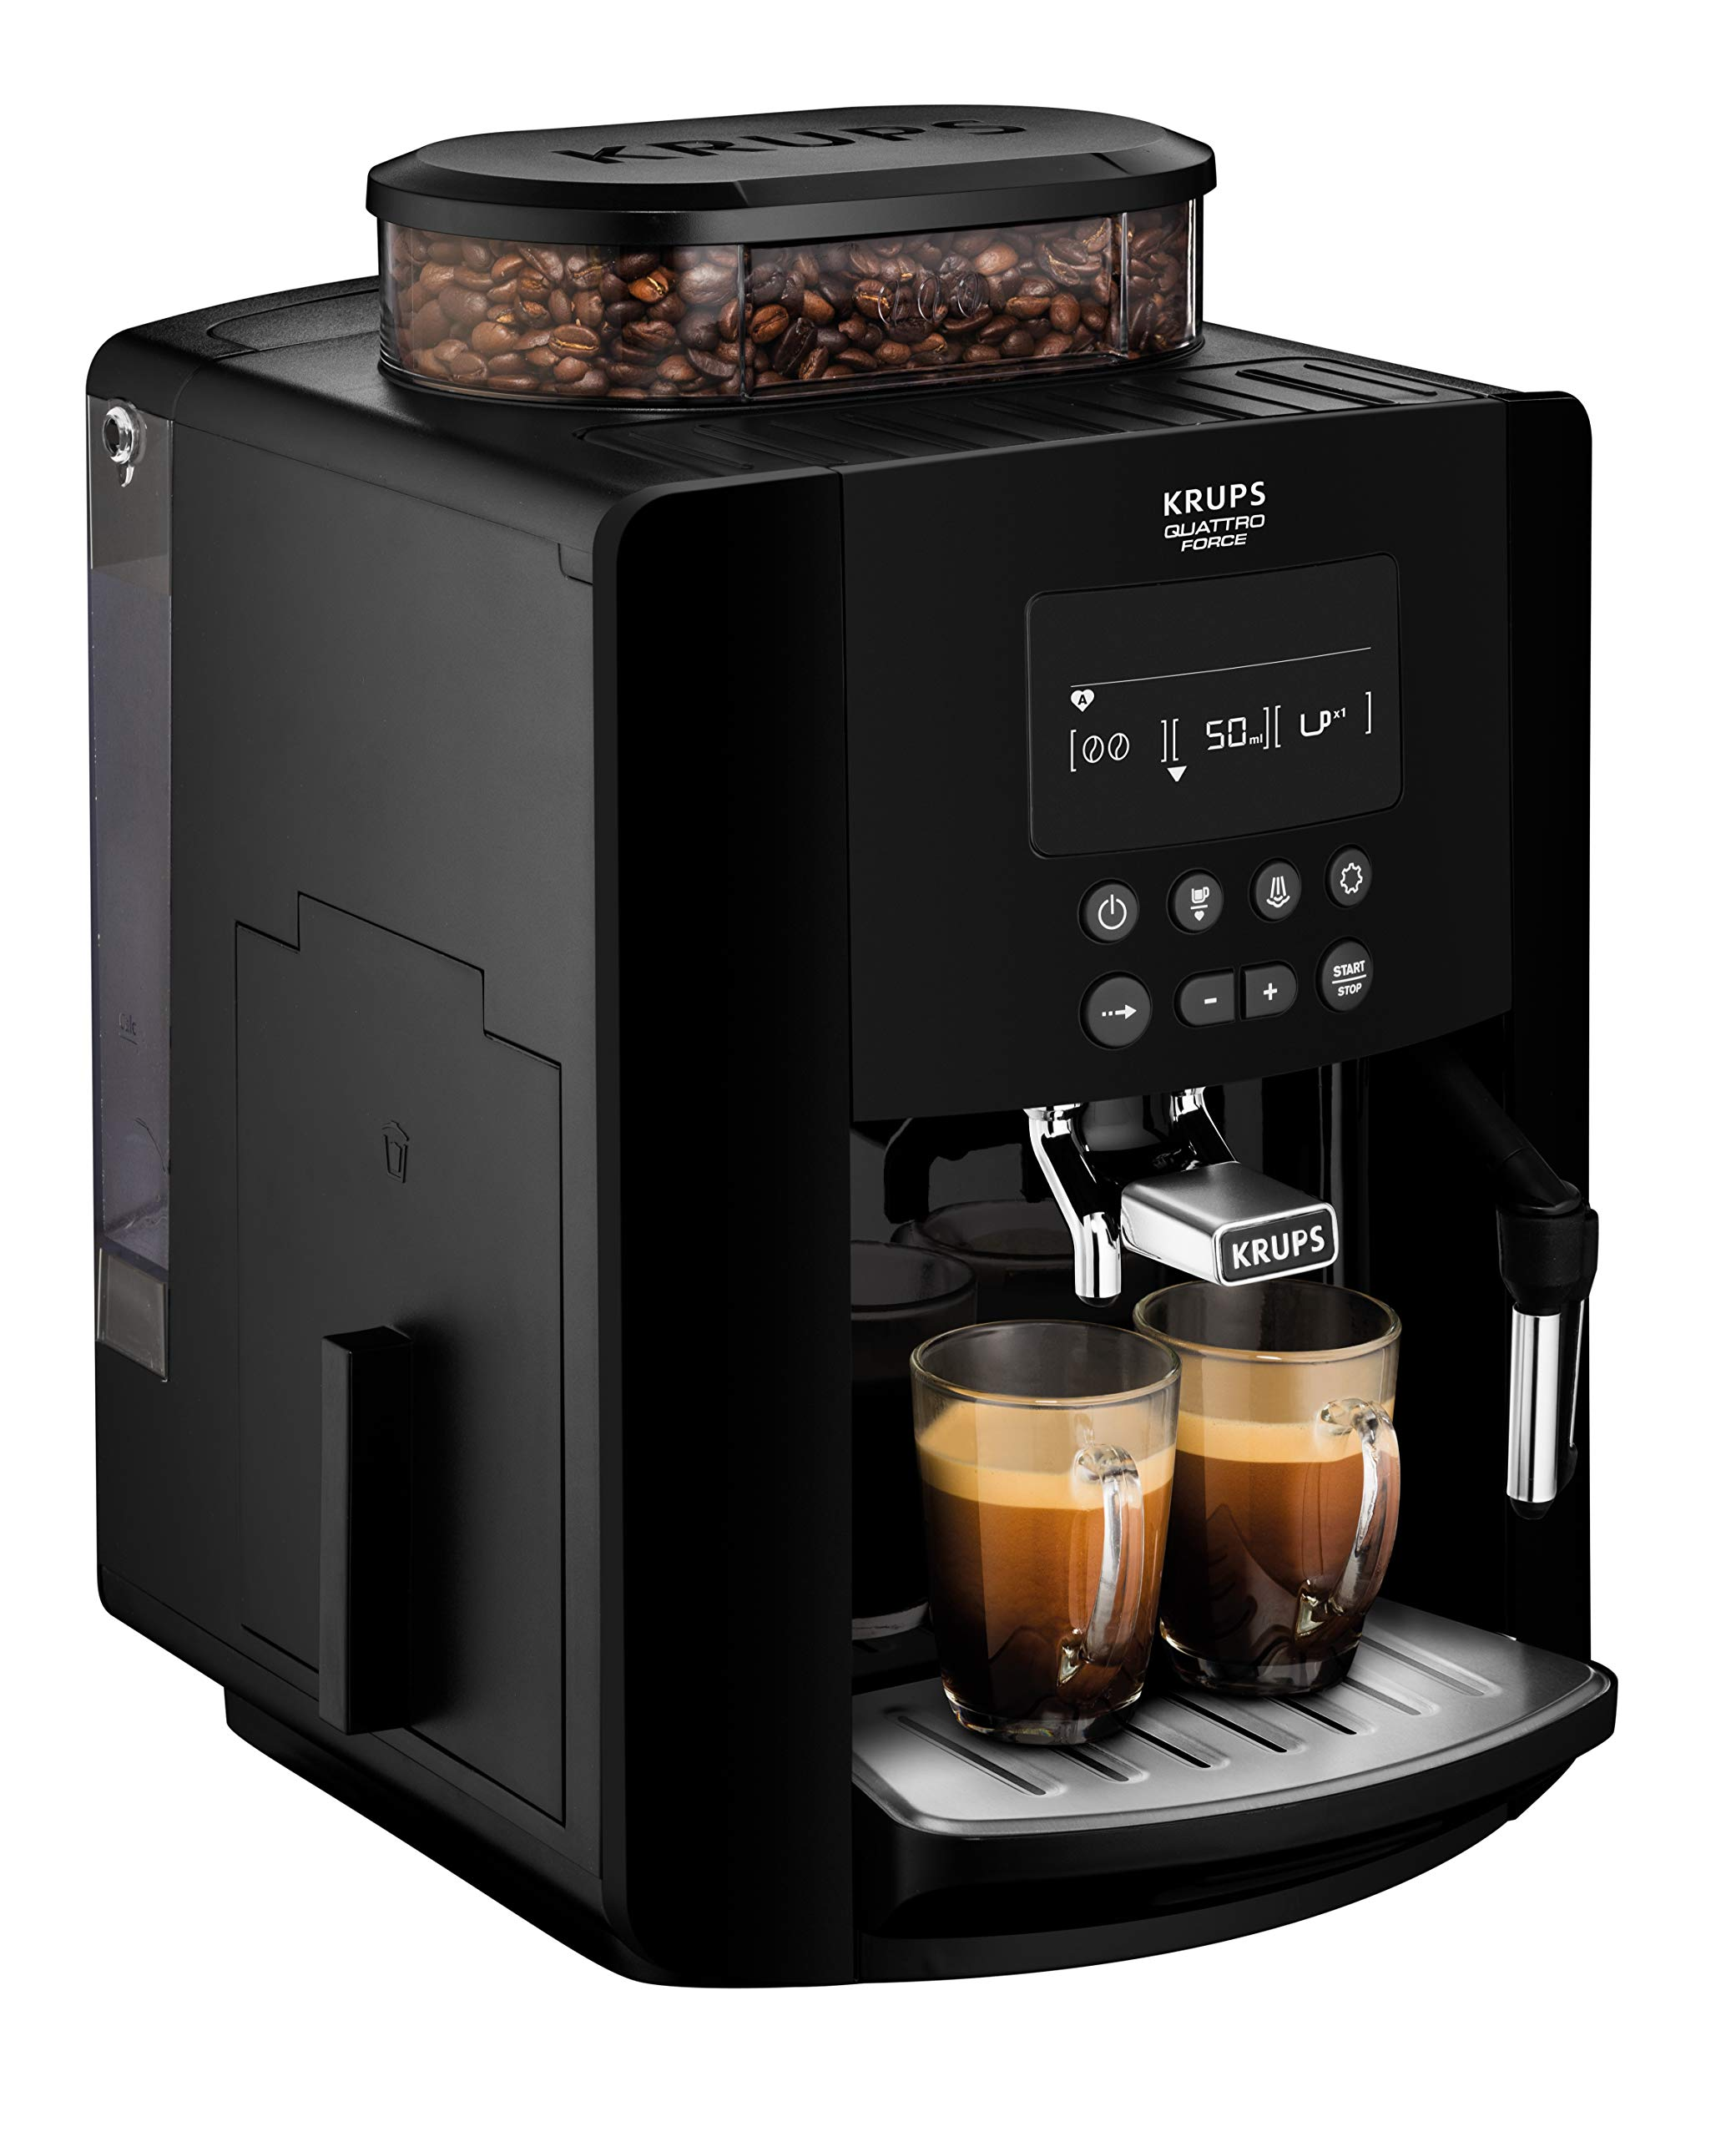 Krups-Arabica-Coffee-Machine-1450-W